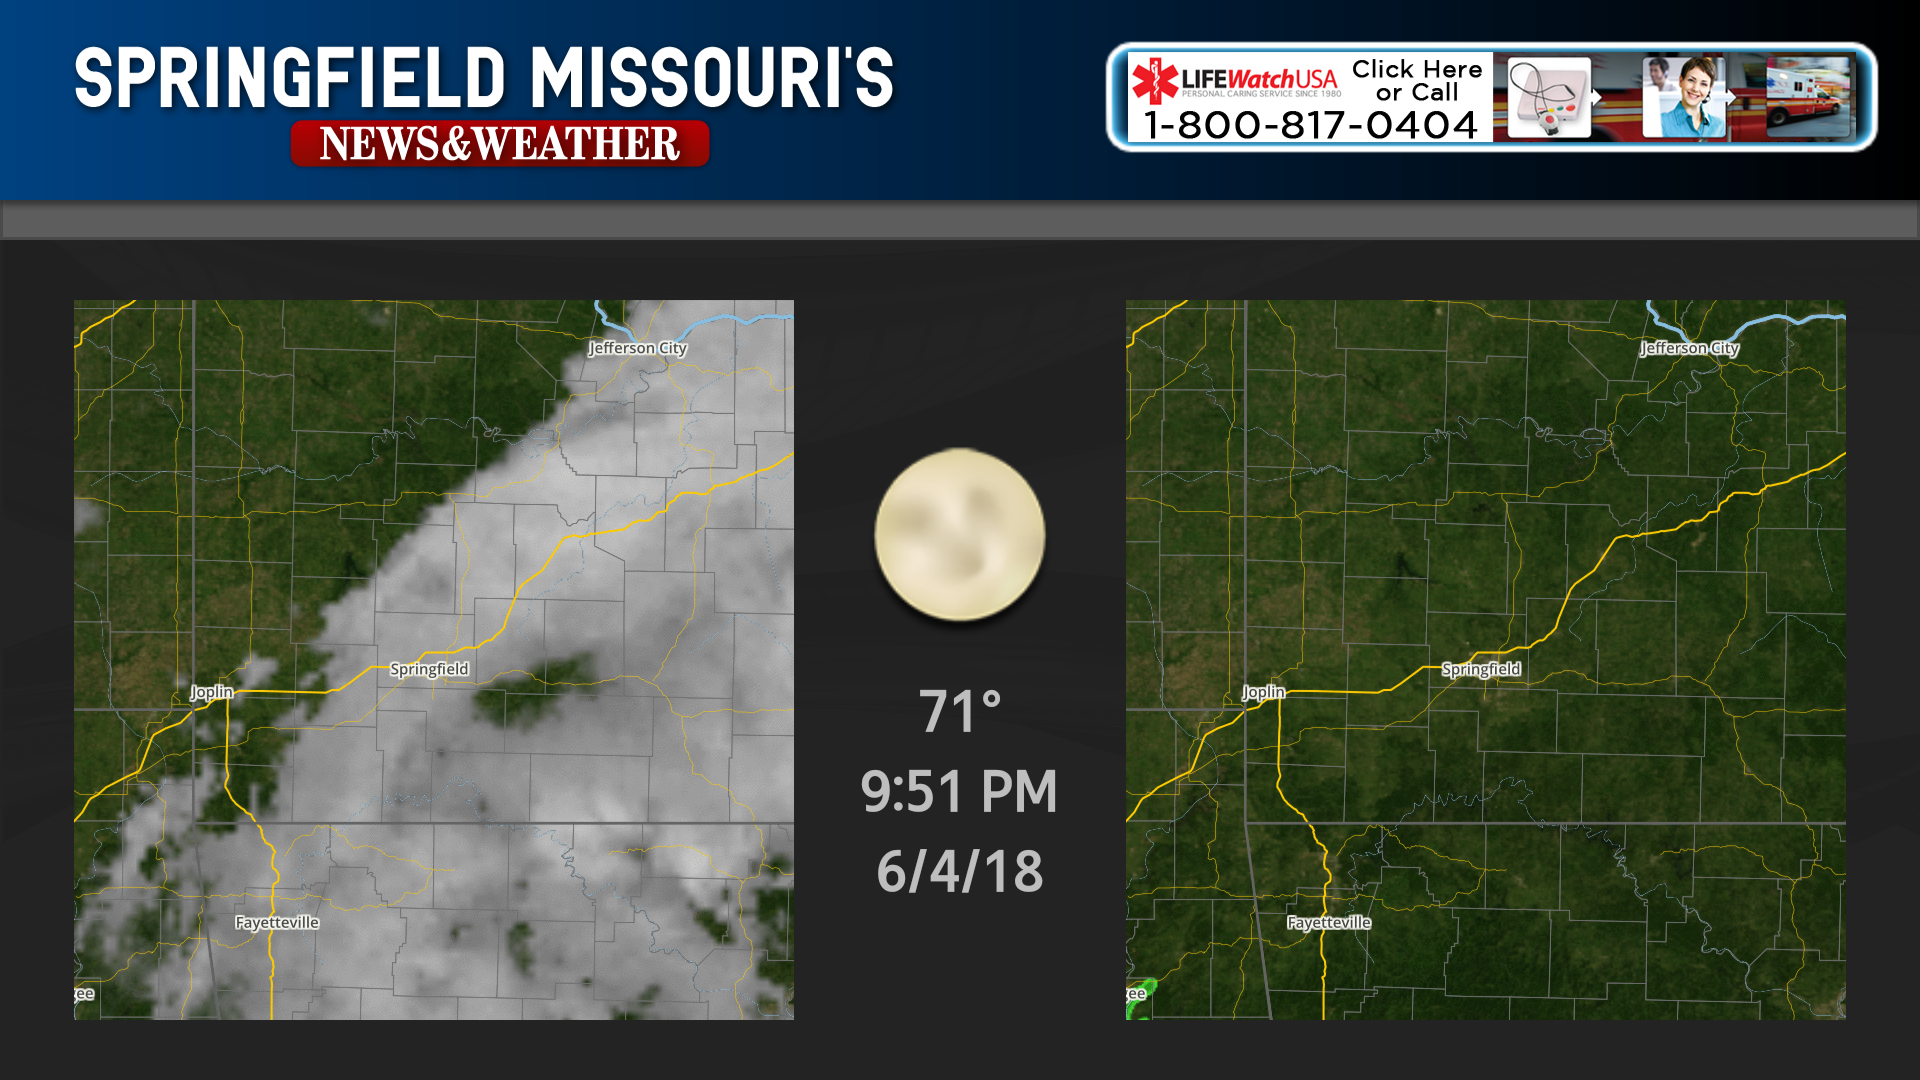 Springfield News & Weather